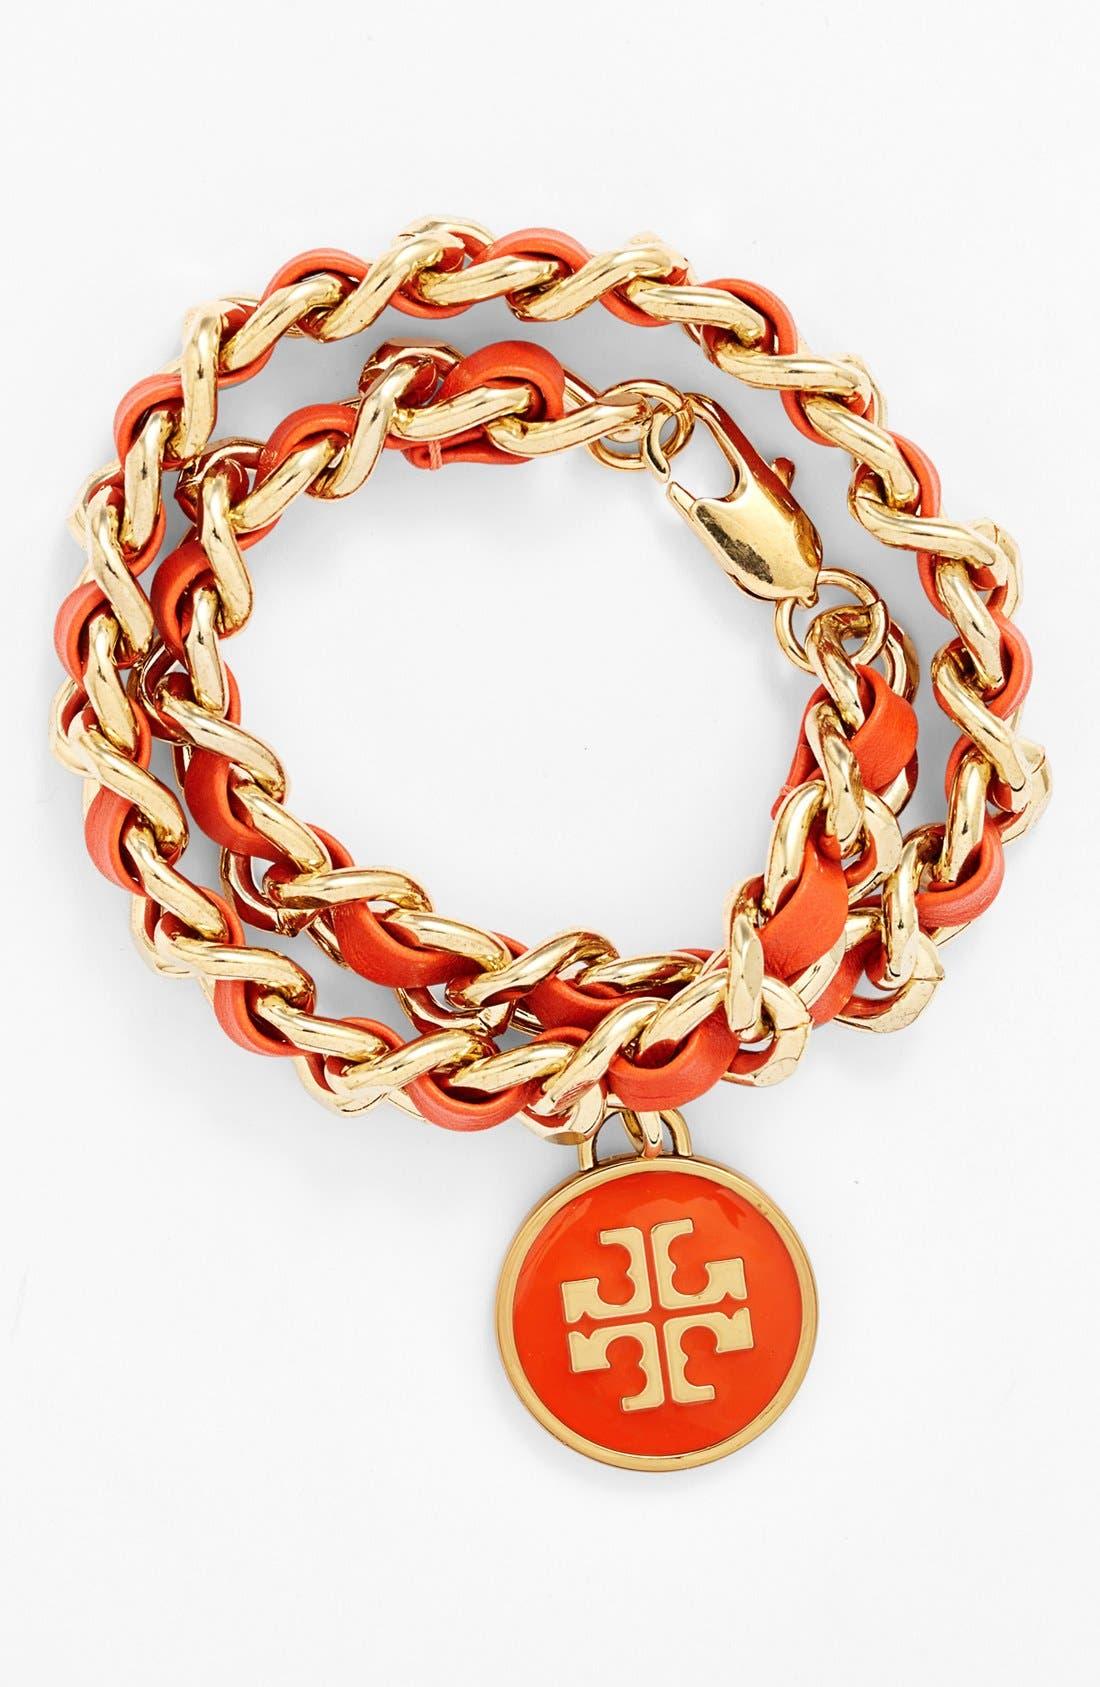 Main Image - Tory Burch Link & Leather Wrap Bracelet